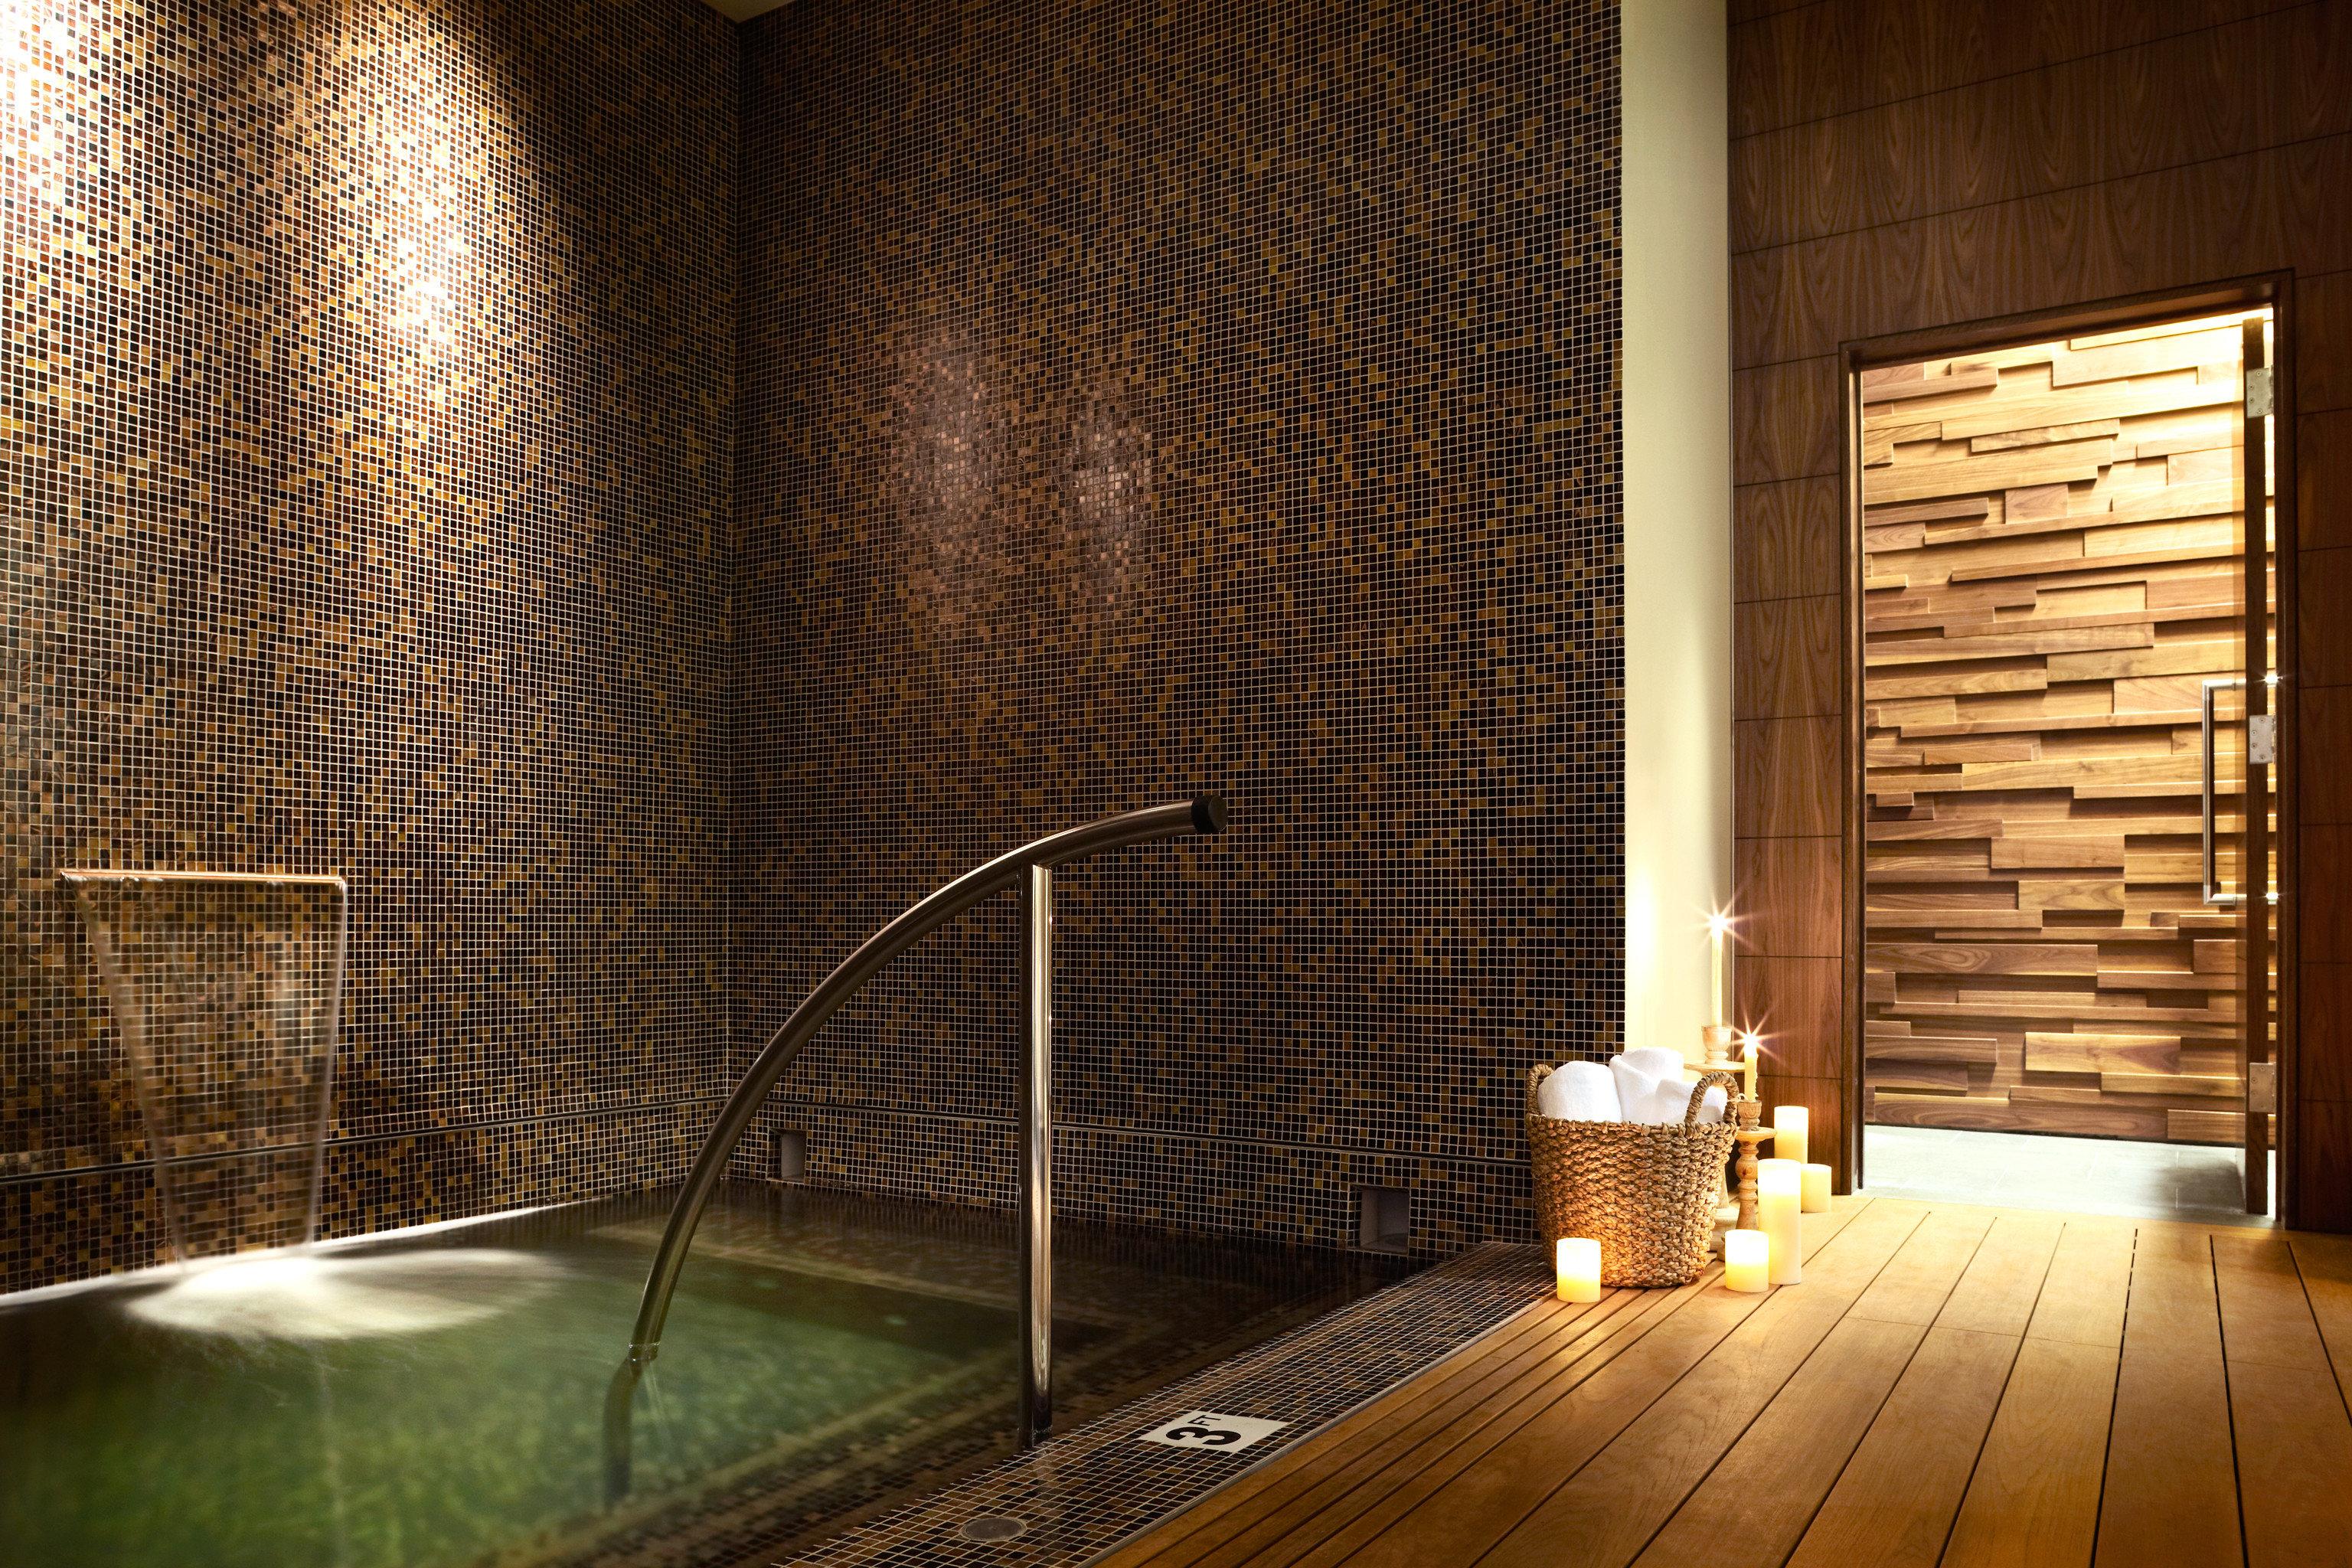 Hot tub/Jacuzzi Luxury Spa Wellness building light Architecture swimming pool lighting flooring Lobby tile tiled